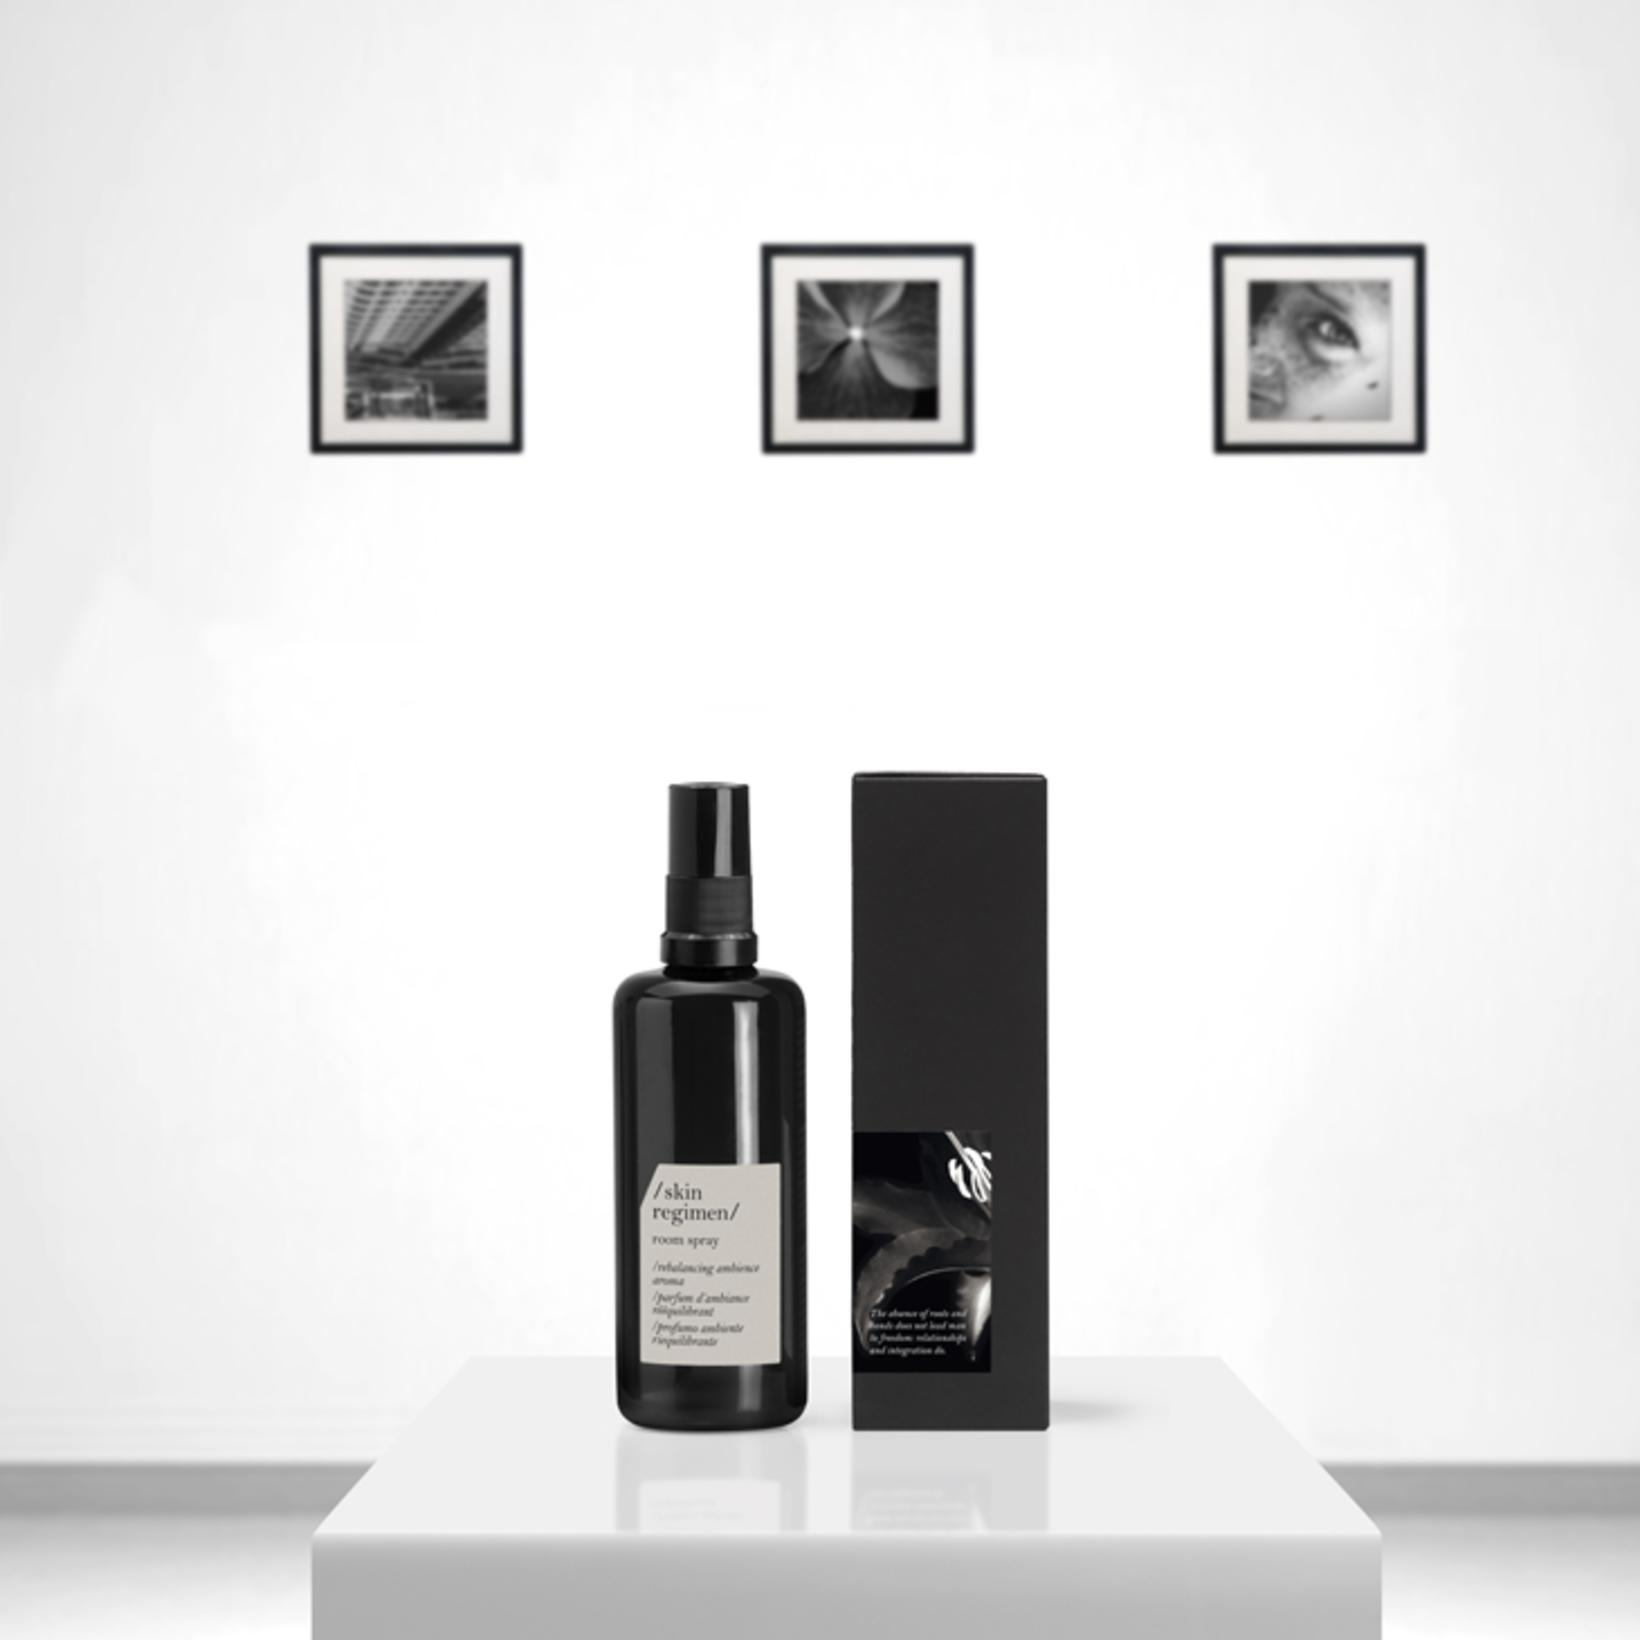 Skin Regimen Essential Oil Room Spray, 10.290 kr.